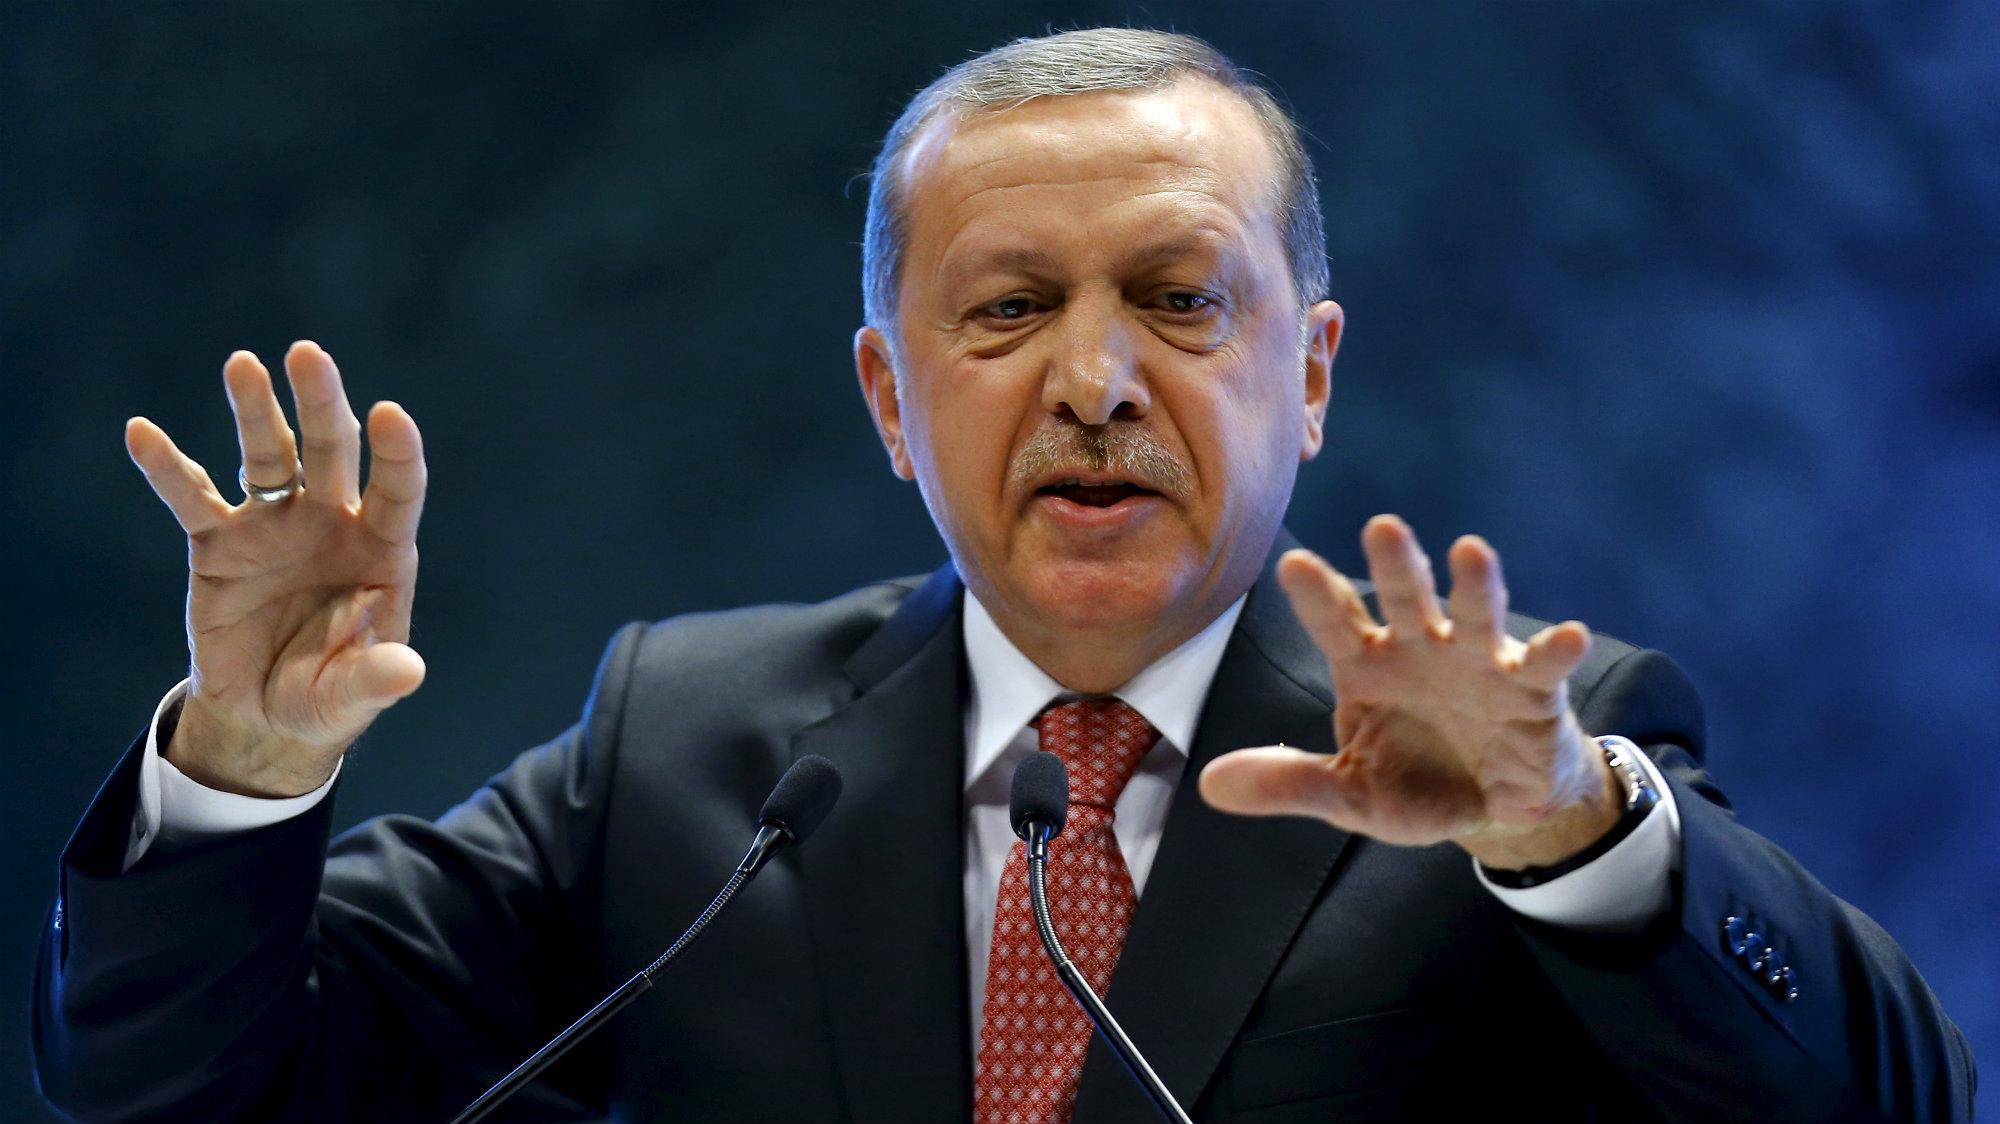 Turkey's President Tayyip Erdogan addresses a conference in Ankara, Turkey, September 3, 2015.